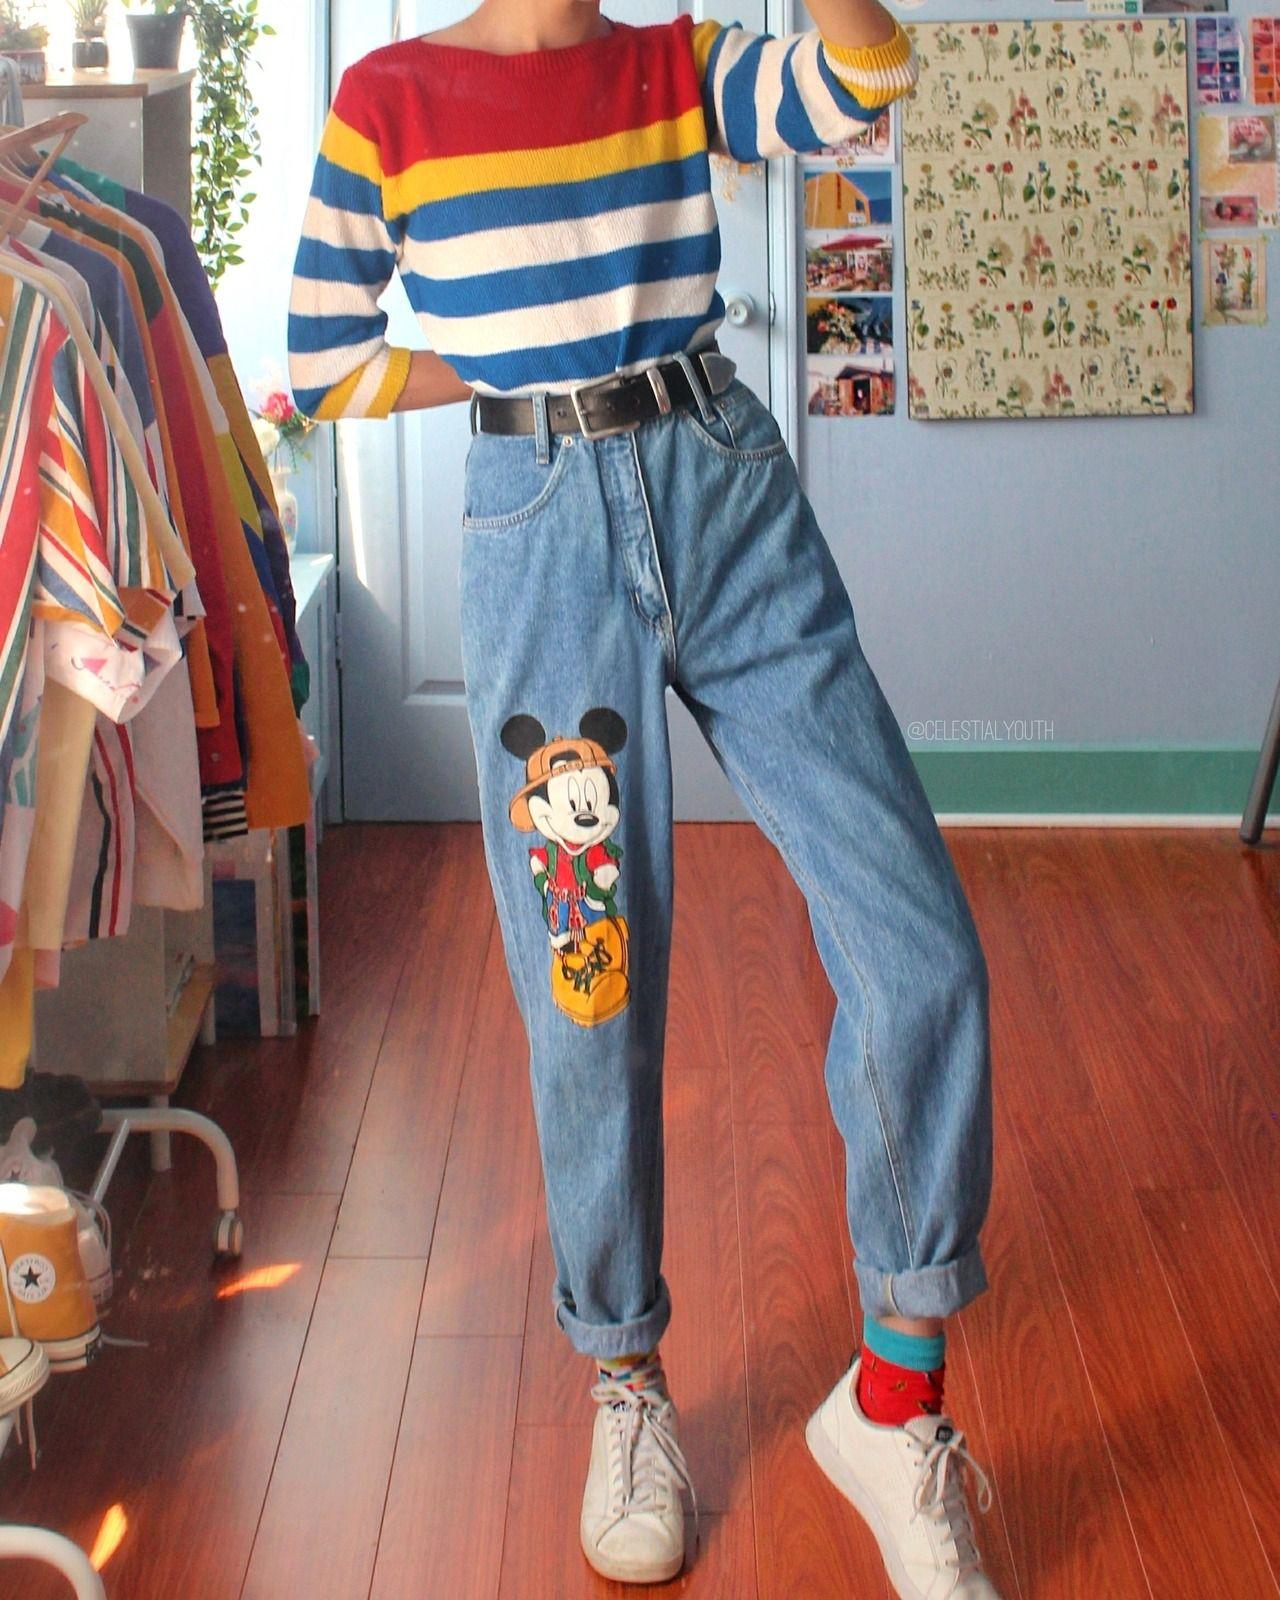 Alex Retro Outfits Pinterest Outfits Fashion